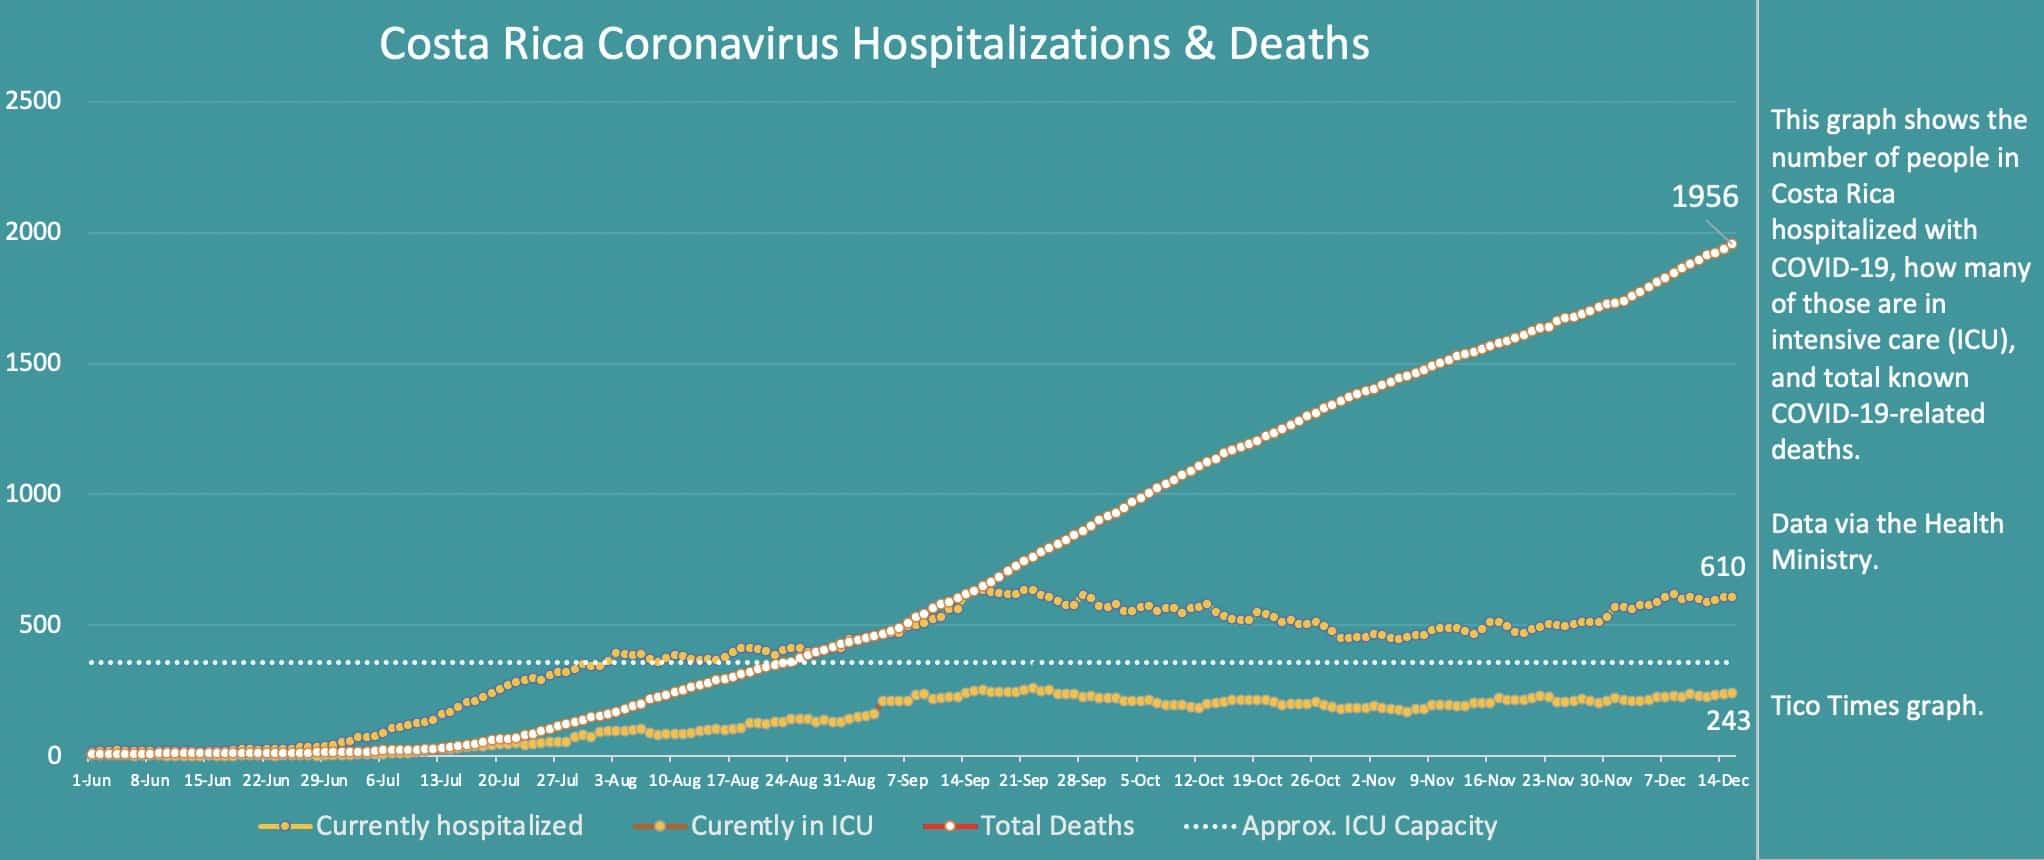 Costa Rica coronavirus hospitalizations and deaths on December 15, 2020